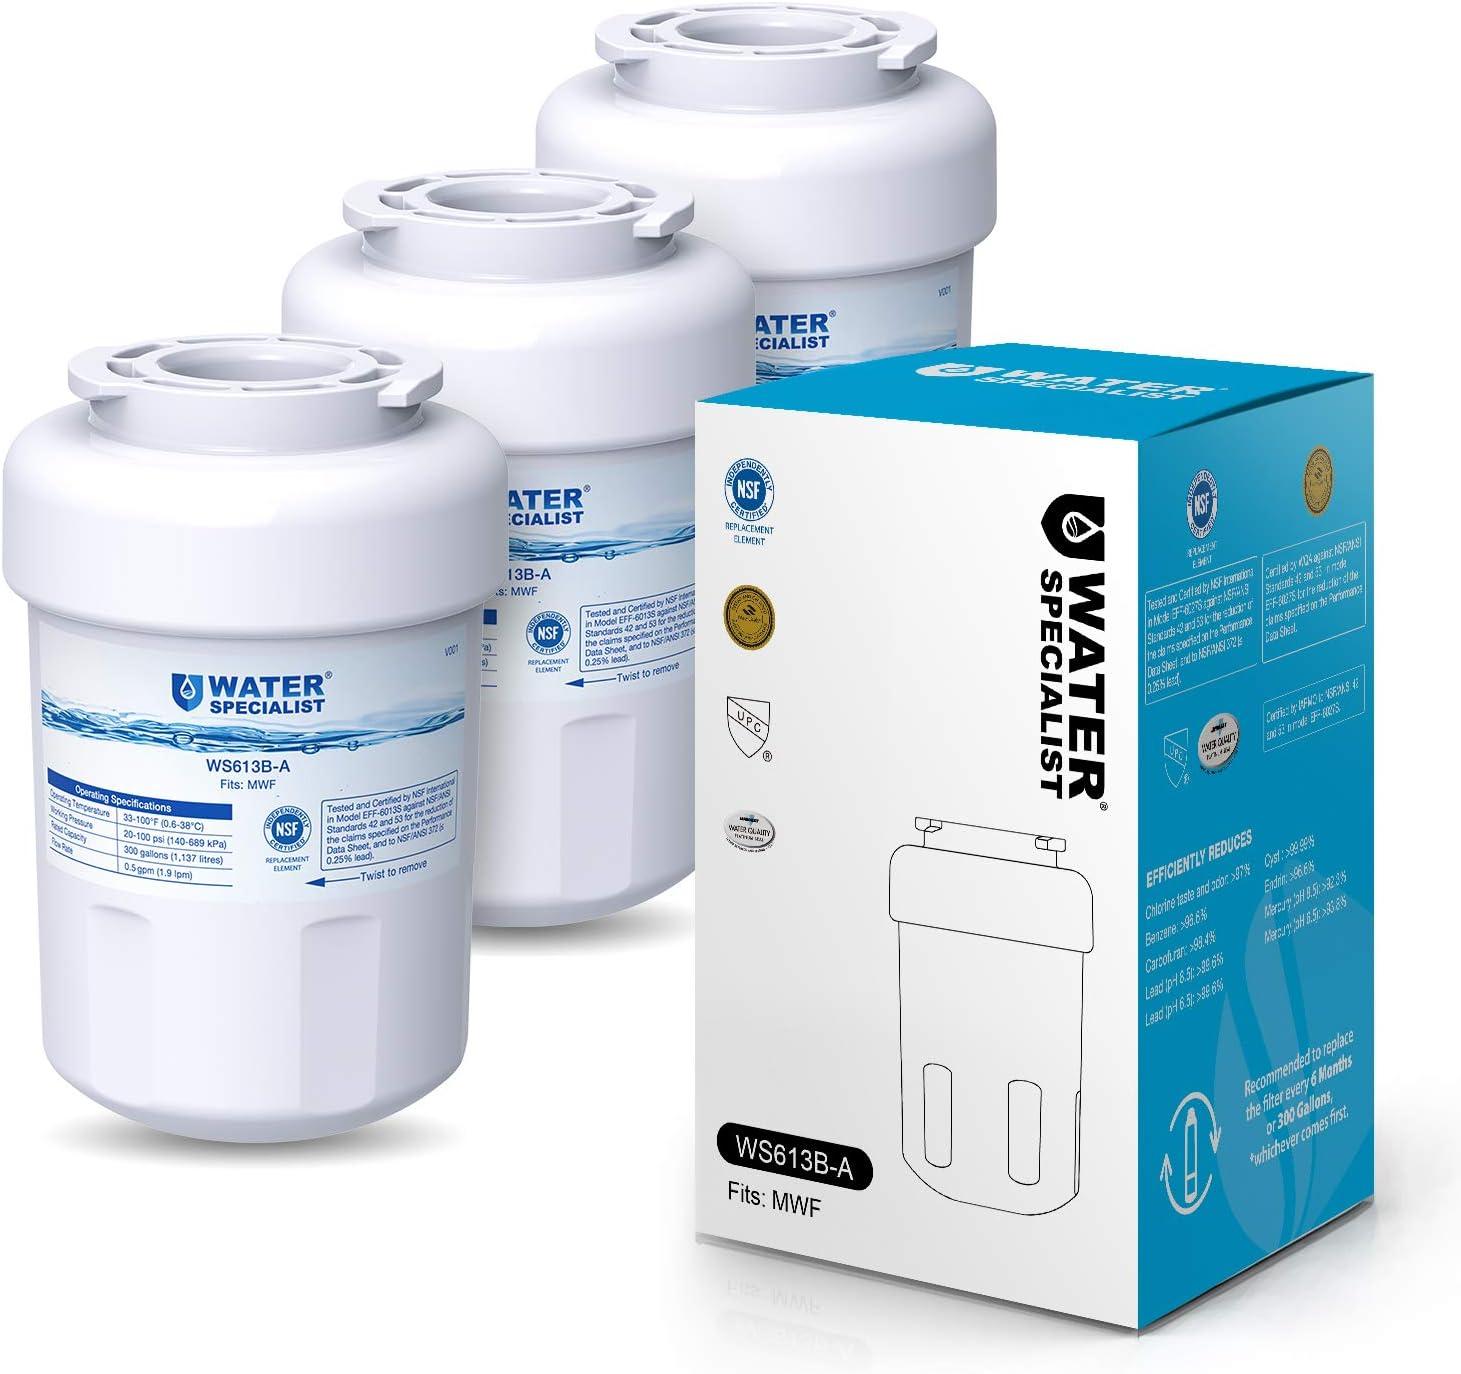 Waterspecialist NSF 53&42 Certified MWF Refrigerator Water Filter